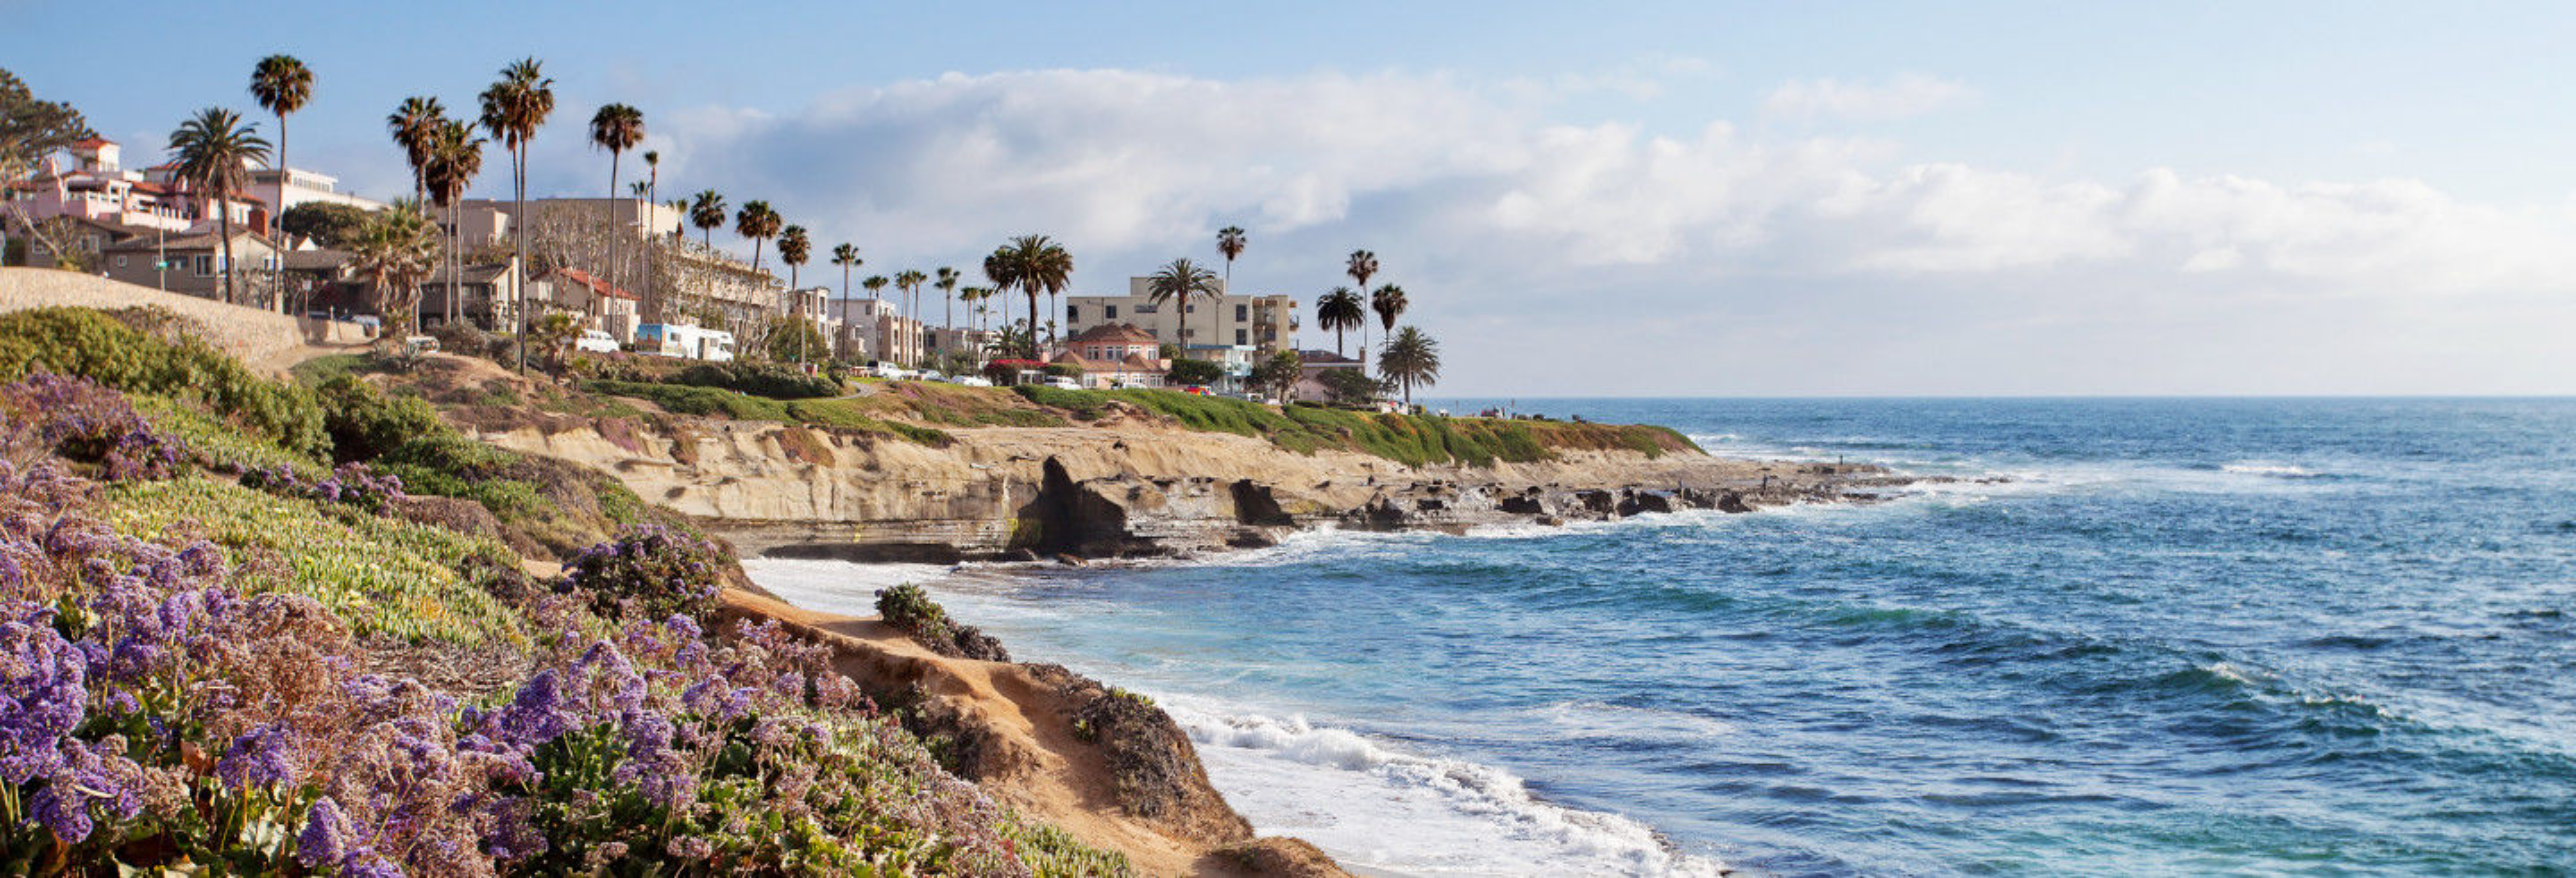 Visita guiada por San Diego